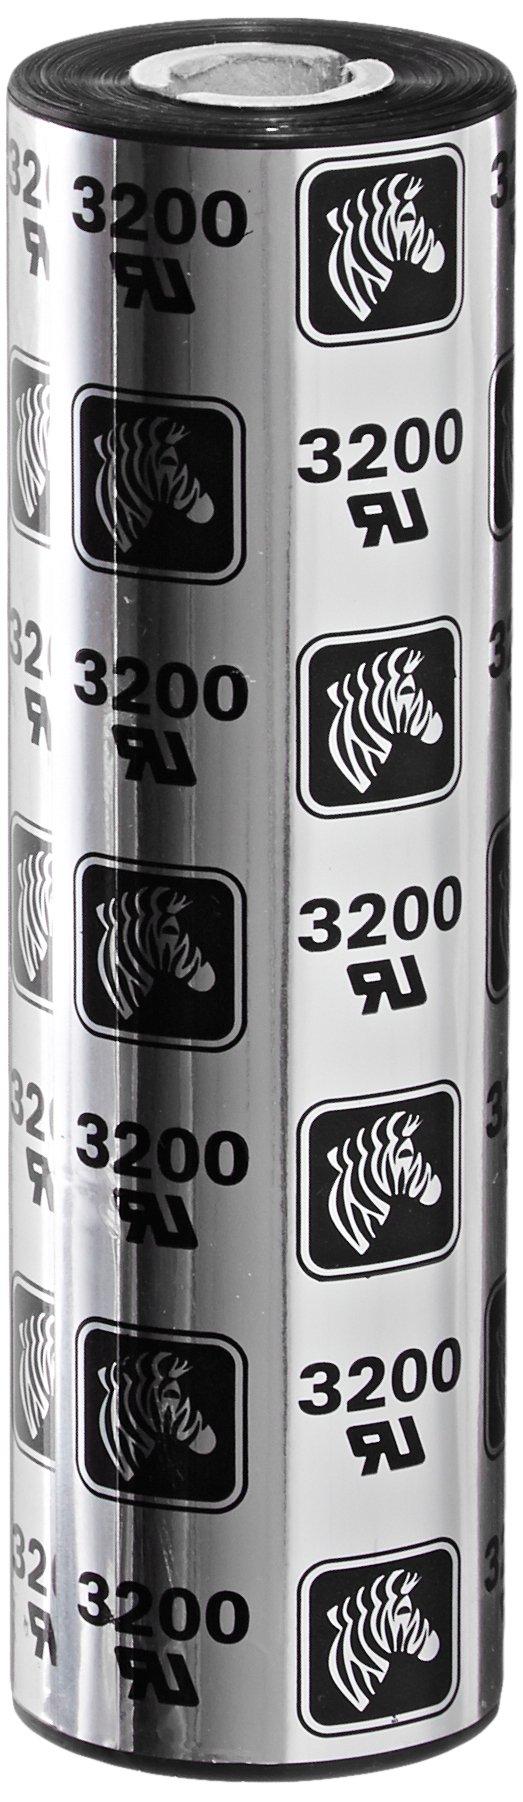 Zebra Technologies 03200GS11007 3200 Wax Resin Print Ribbon, Thermal Transfer, 4.3'' x 242', 110 mm x 74 m, Black (Pack of 12) by Zebra Technologies